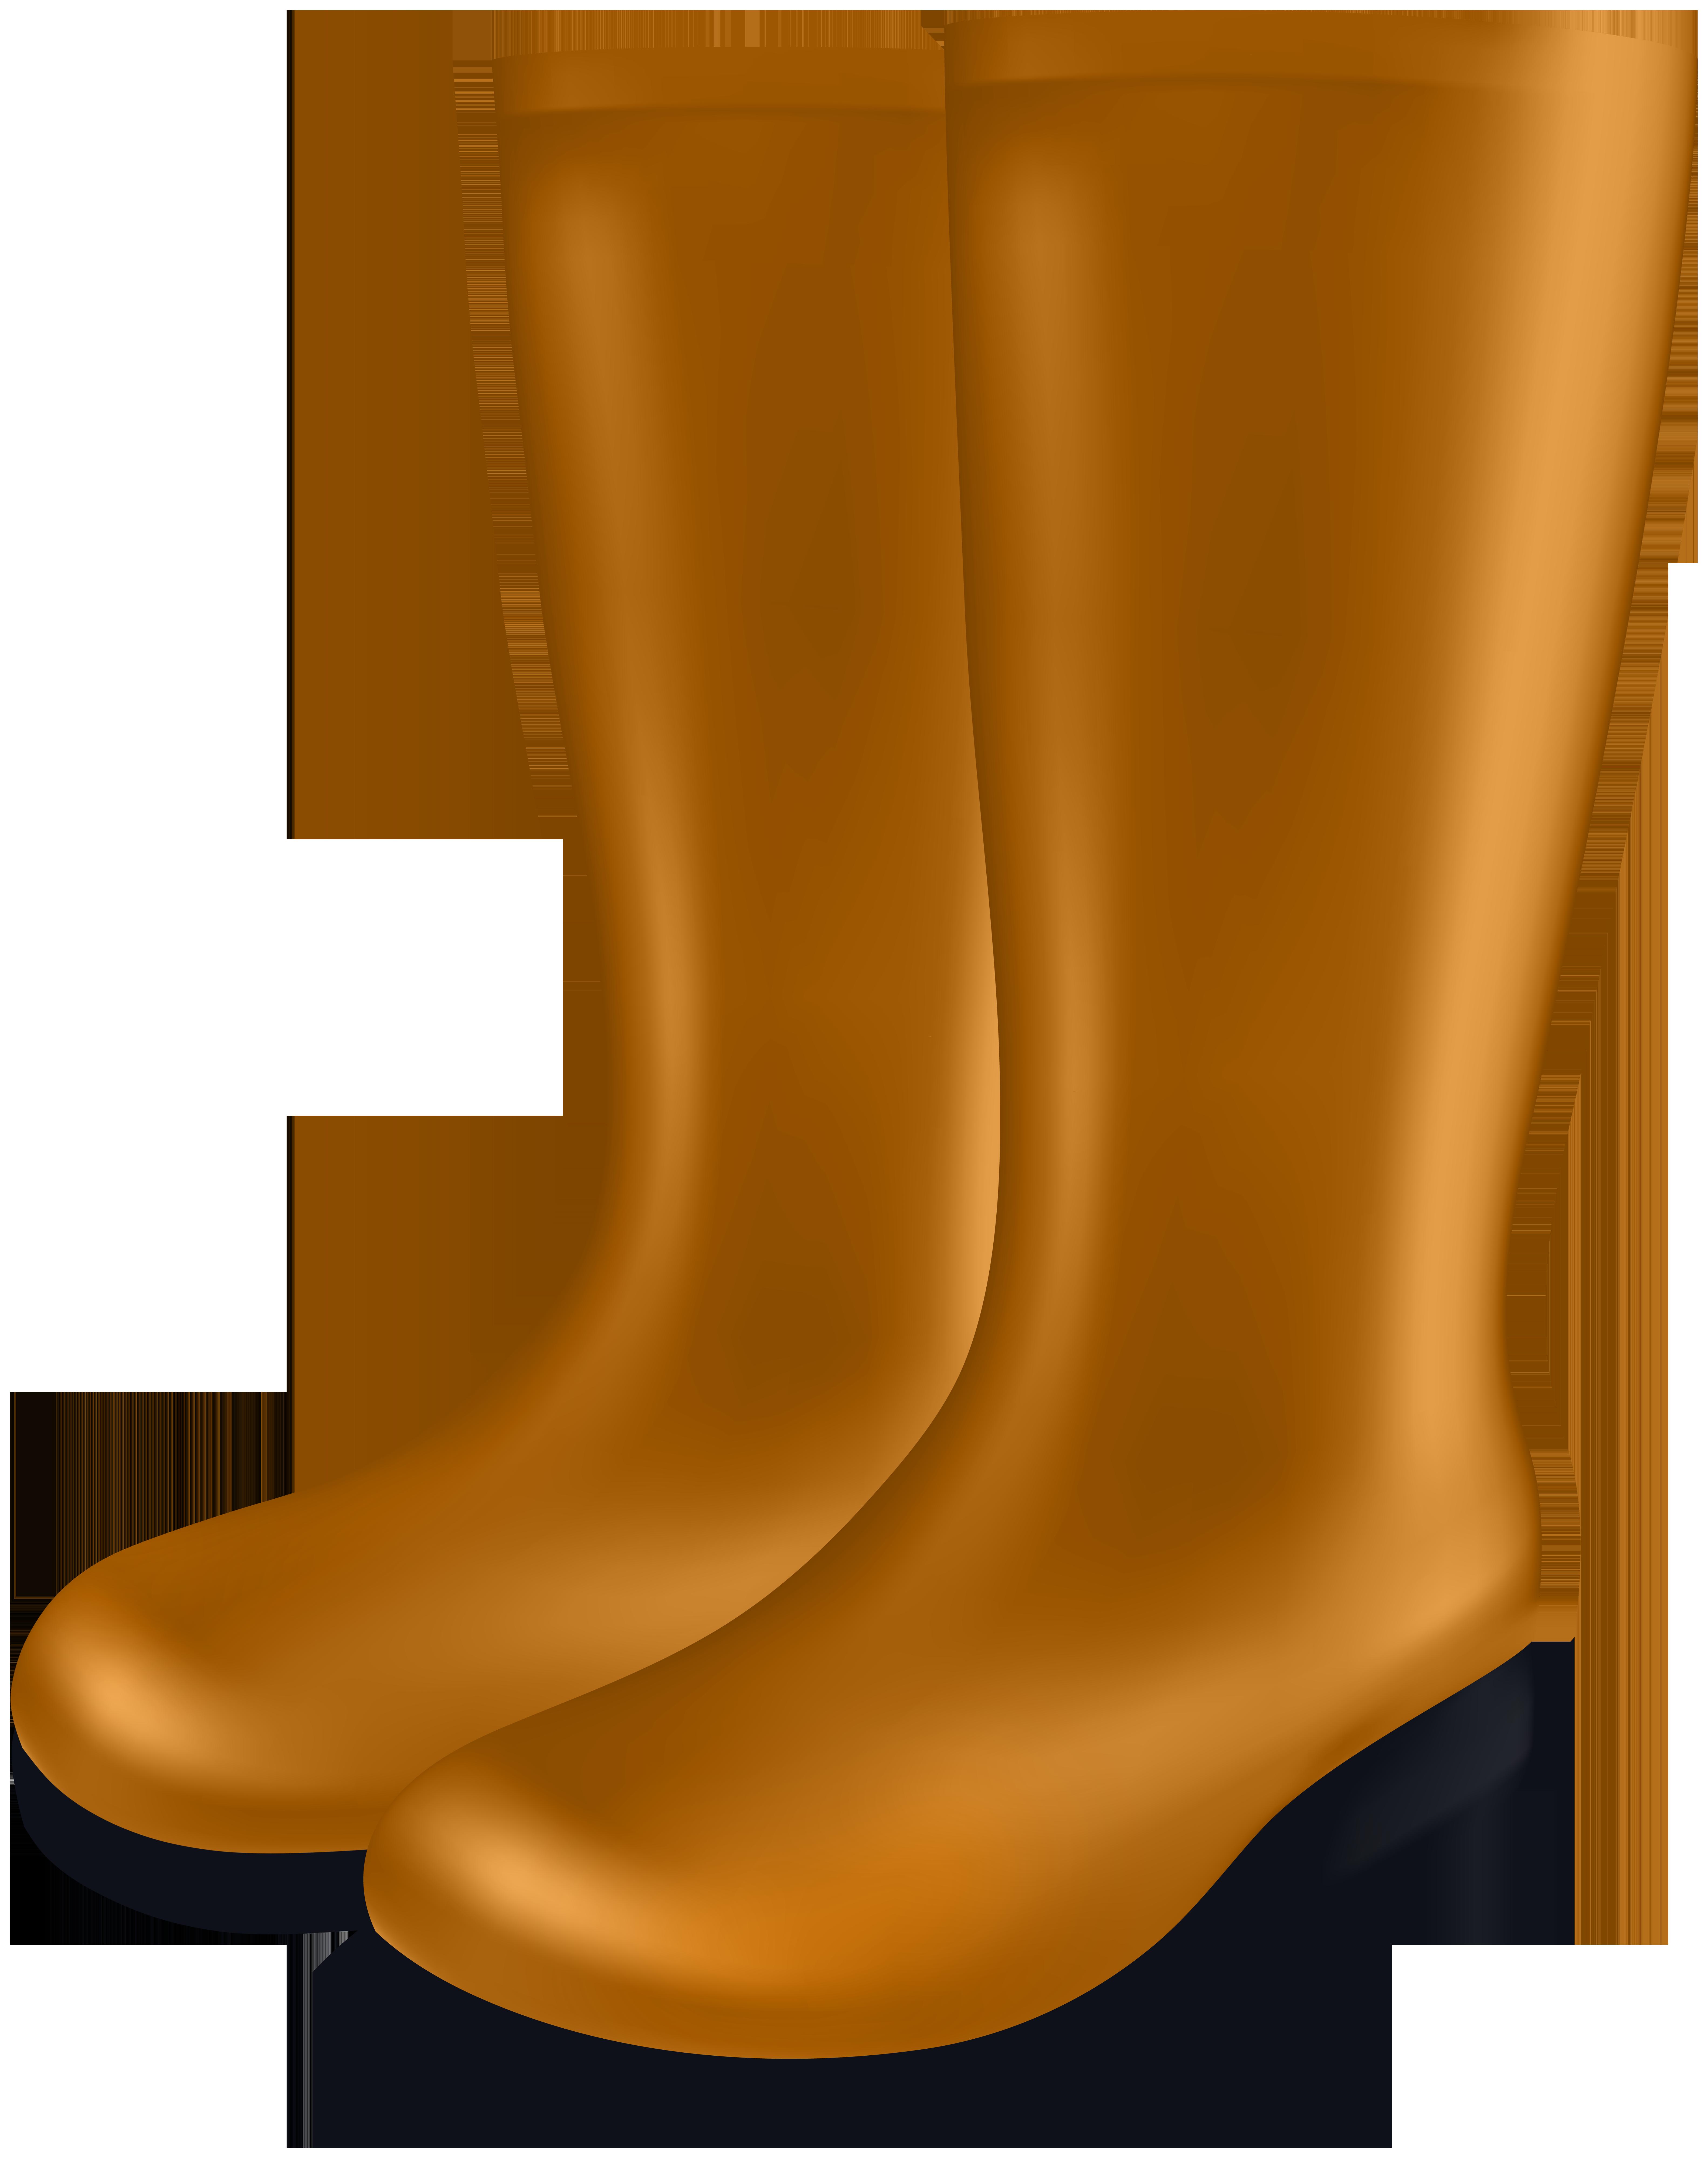 Rubber Boots PNG Clip Art Image.